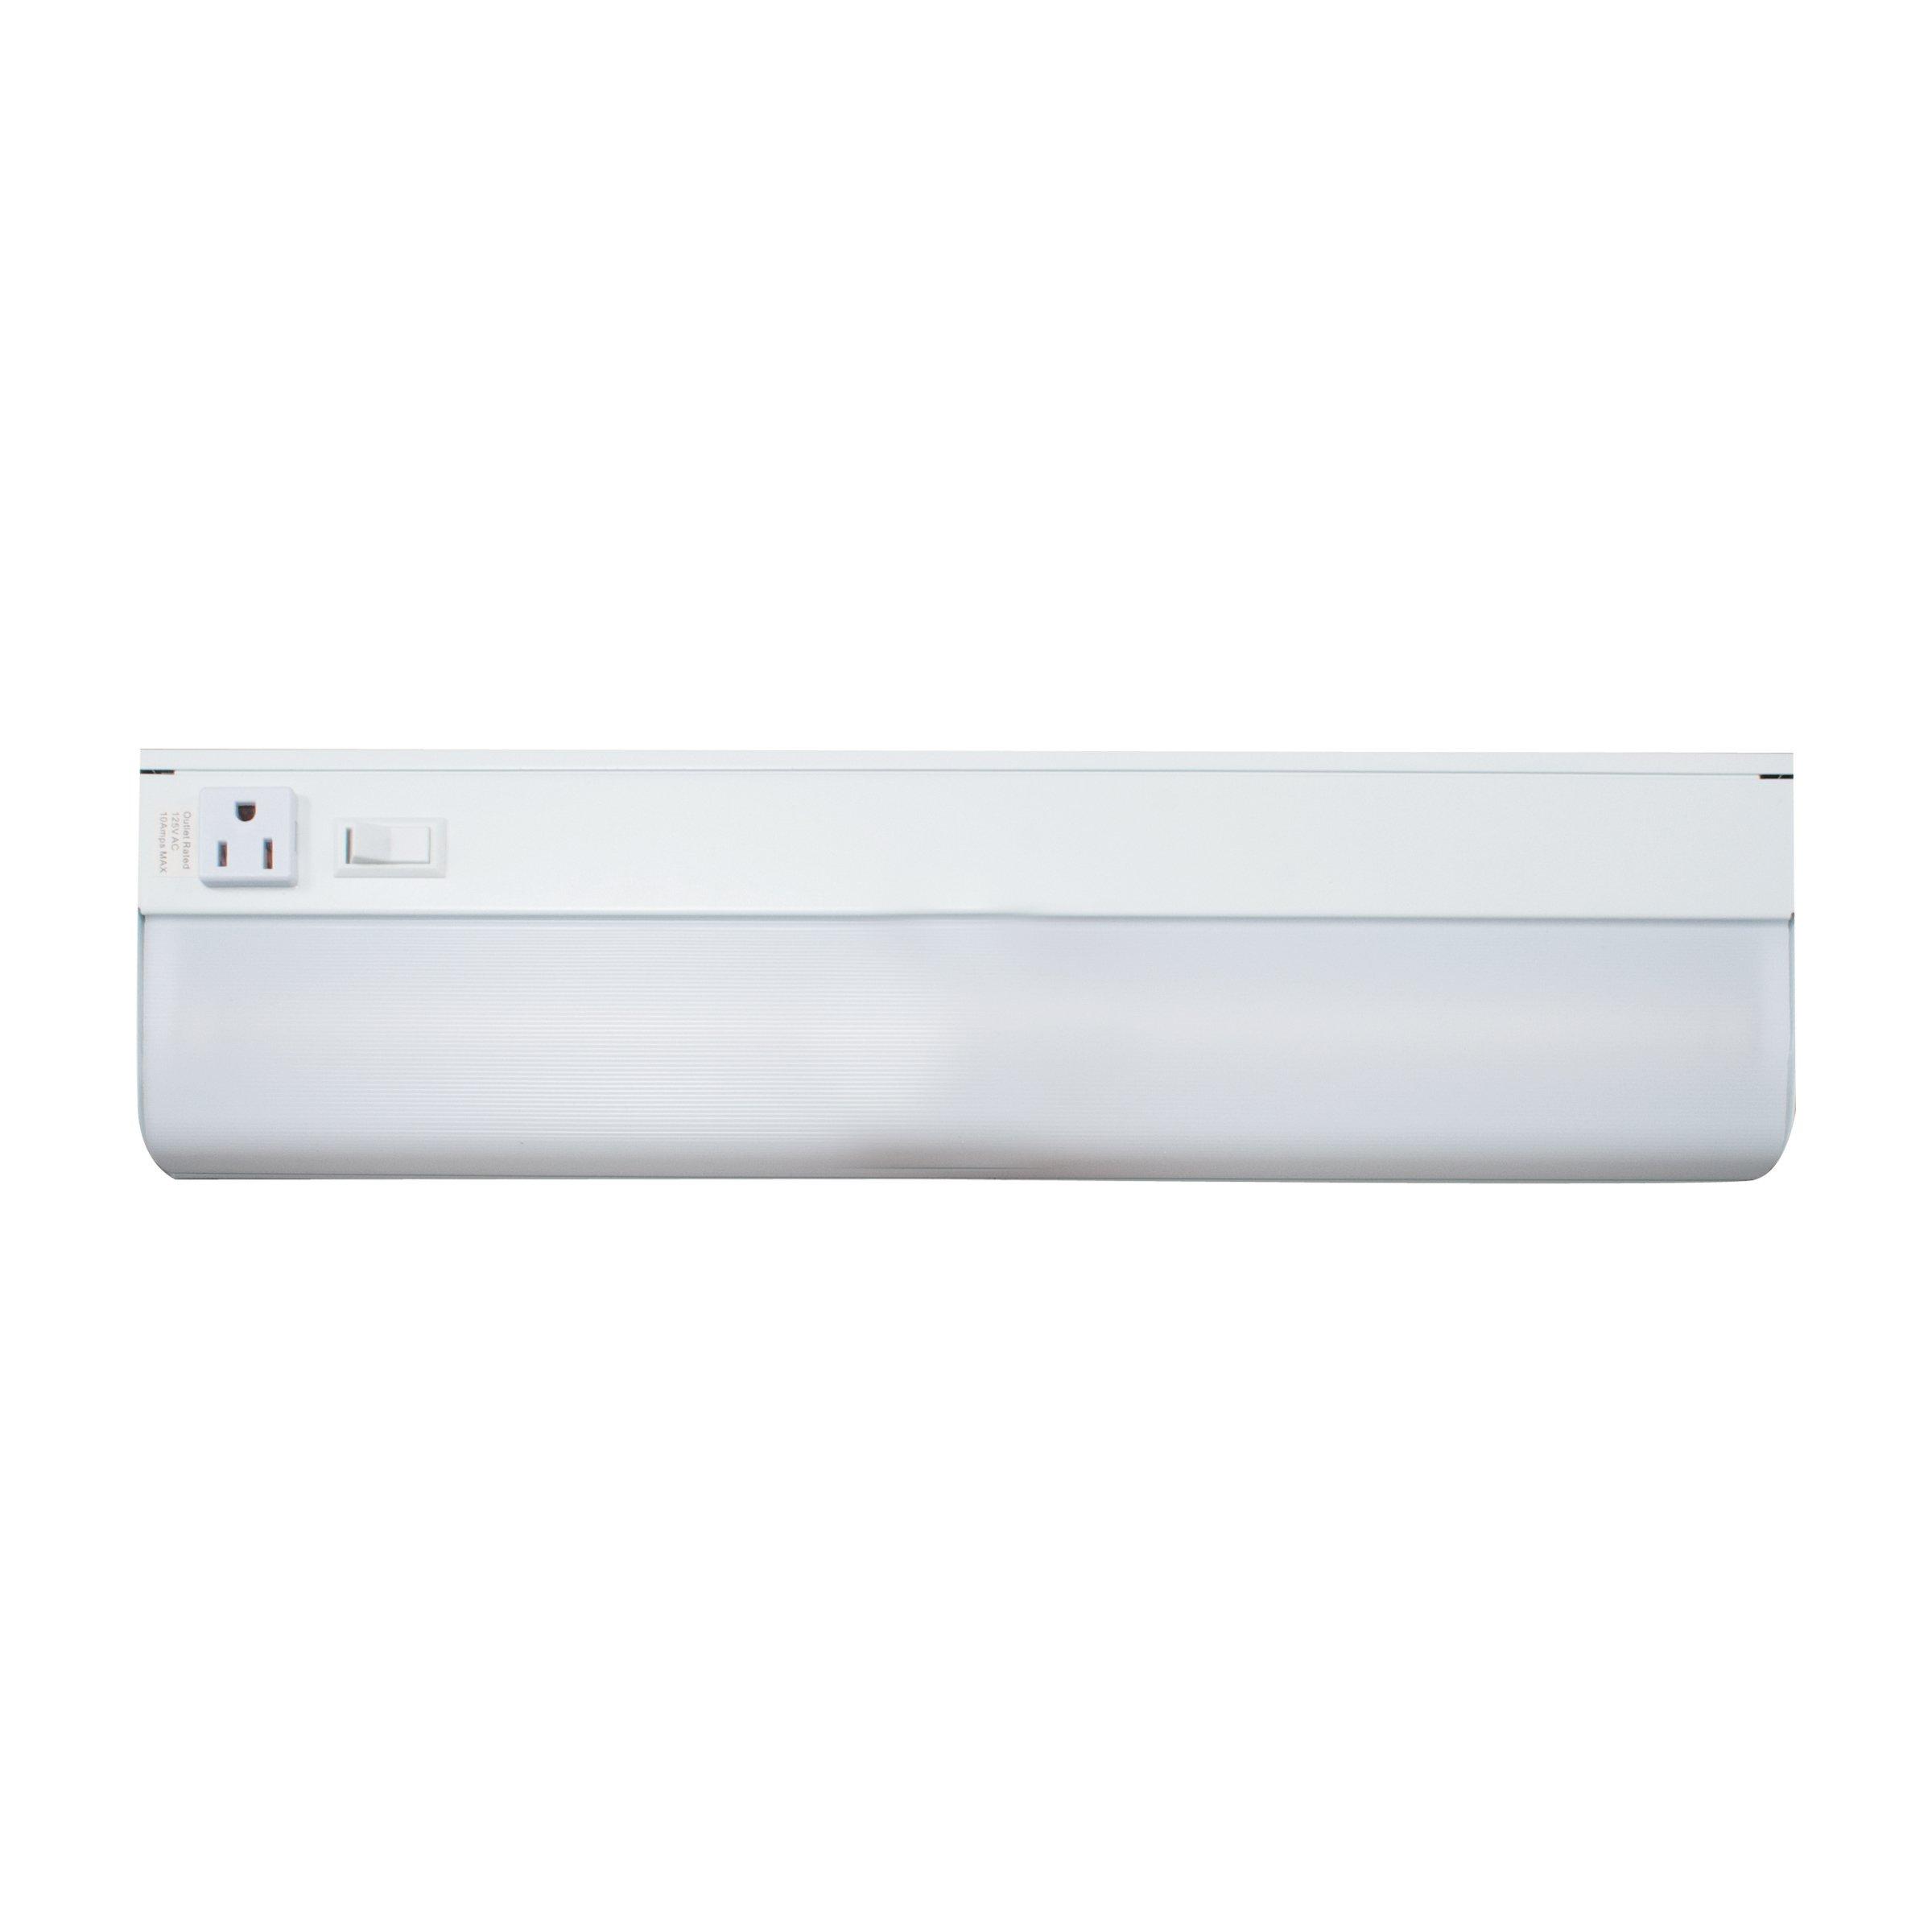 LEDU L9169 Under-Cabinet LED Lamp, 18'' Long, White